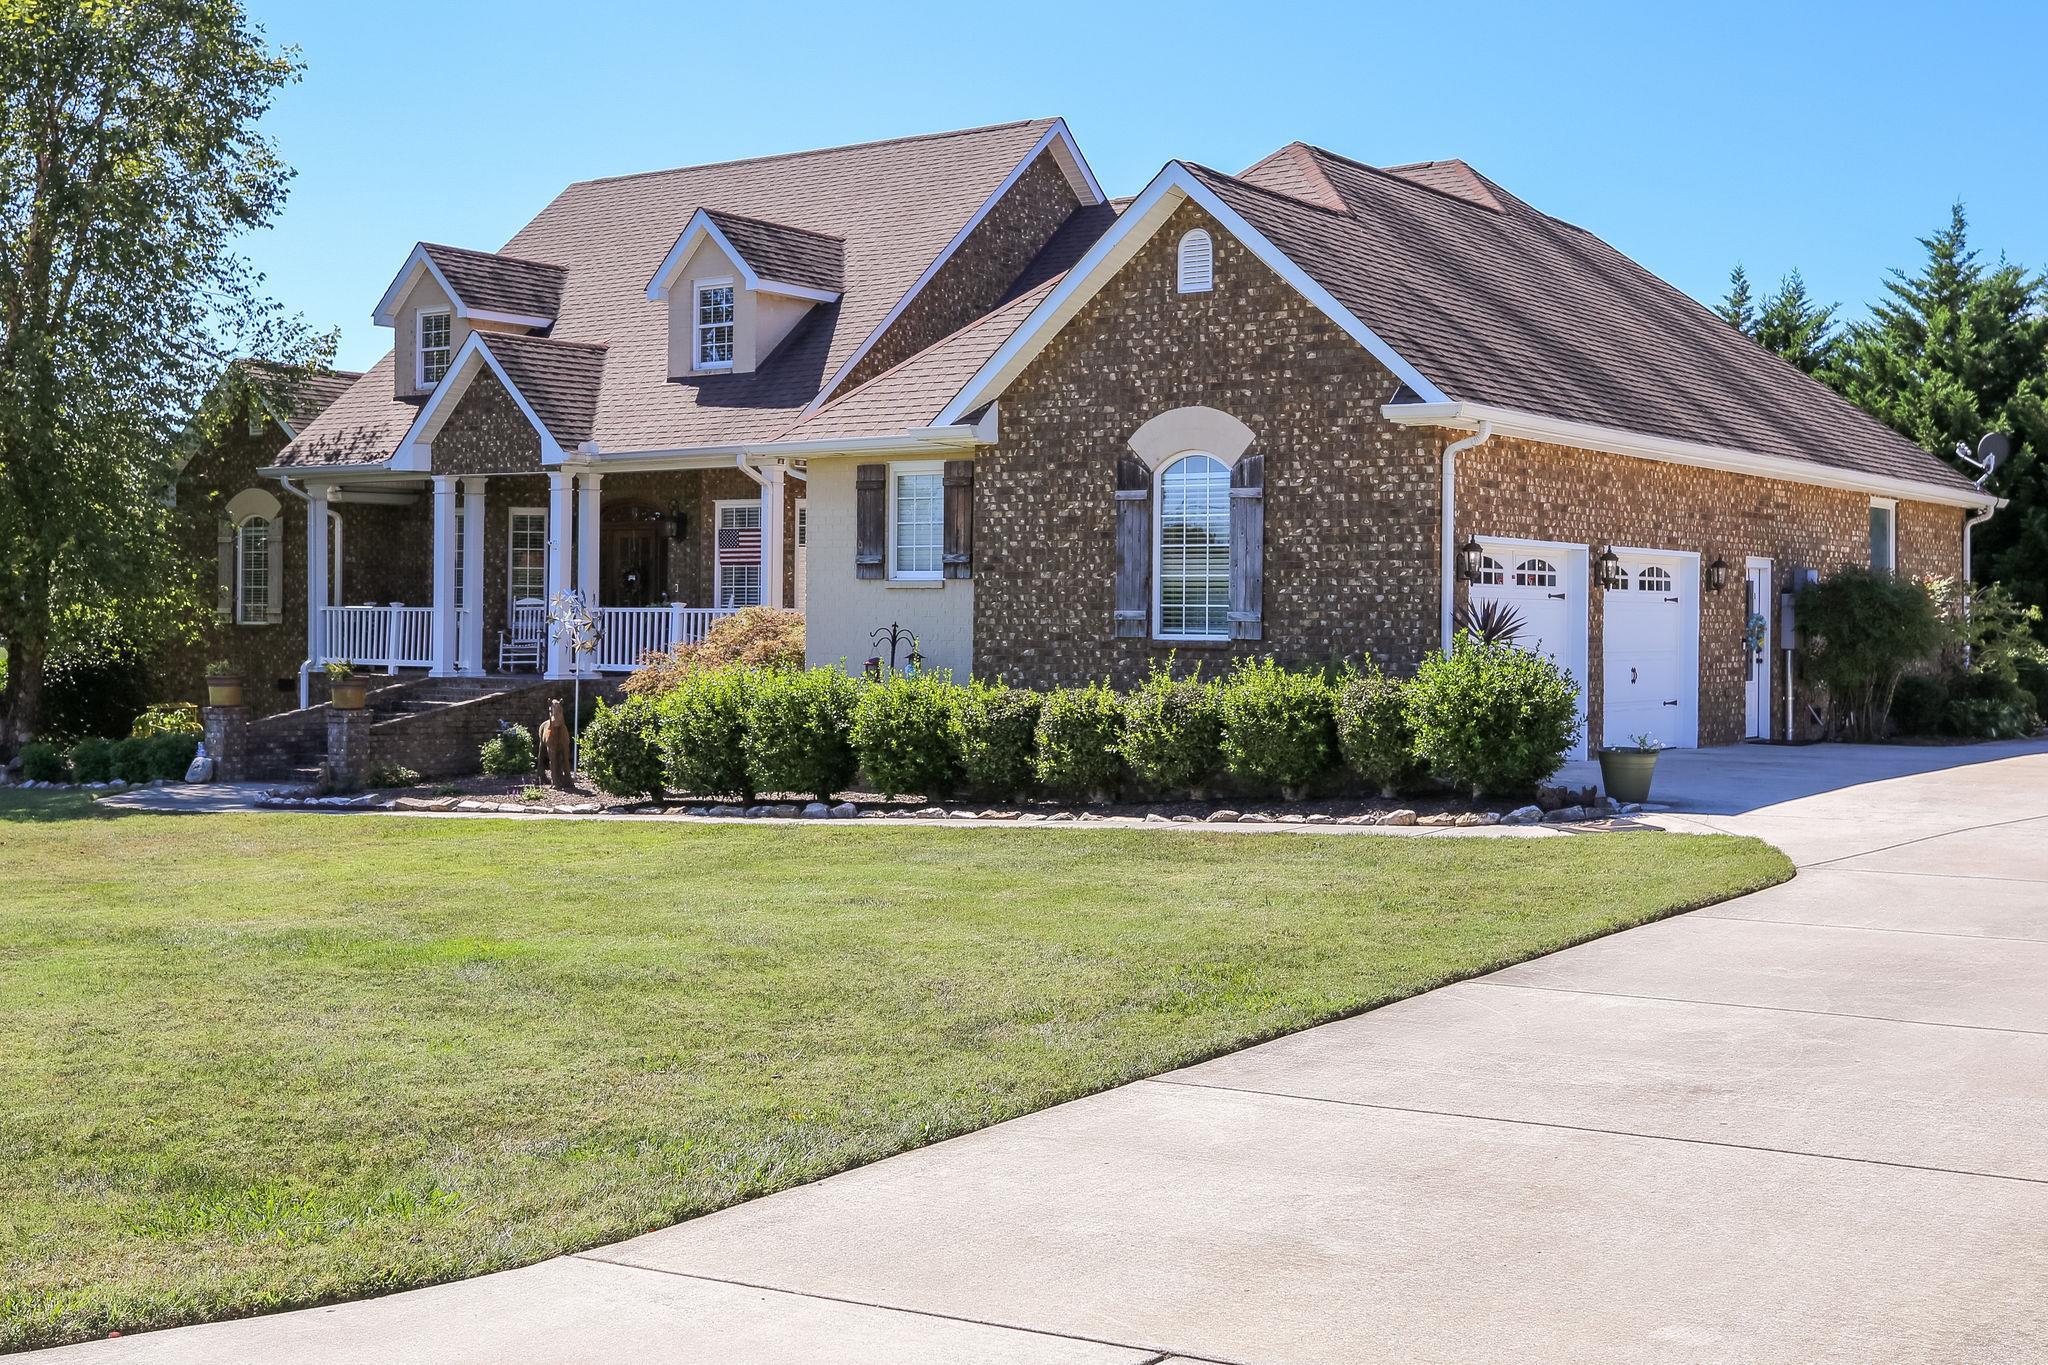 102 Highpoint Blvd, Tullahoma, TN 37388 - Tullahoma, TN real estate listing